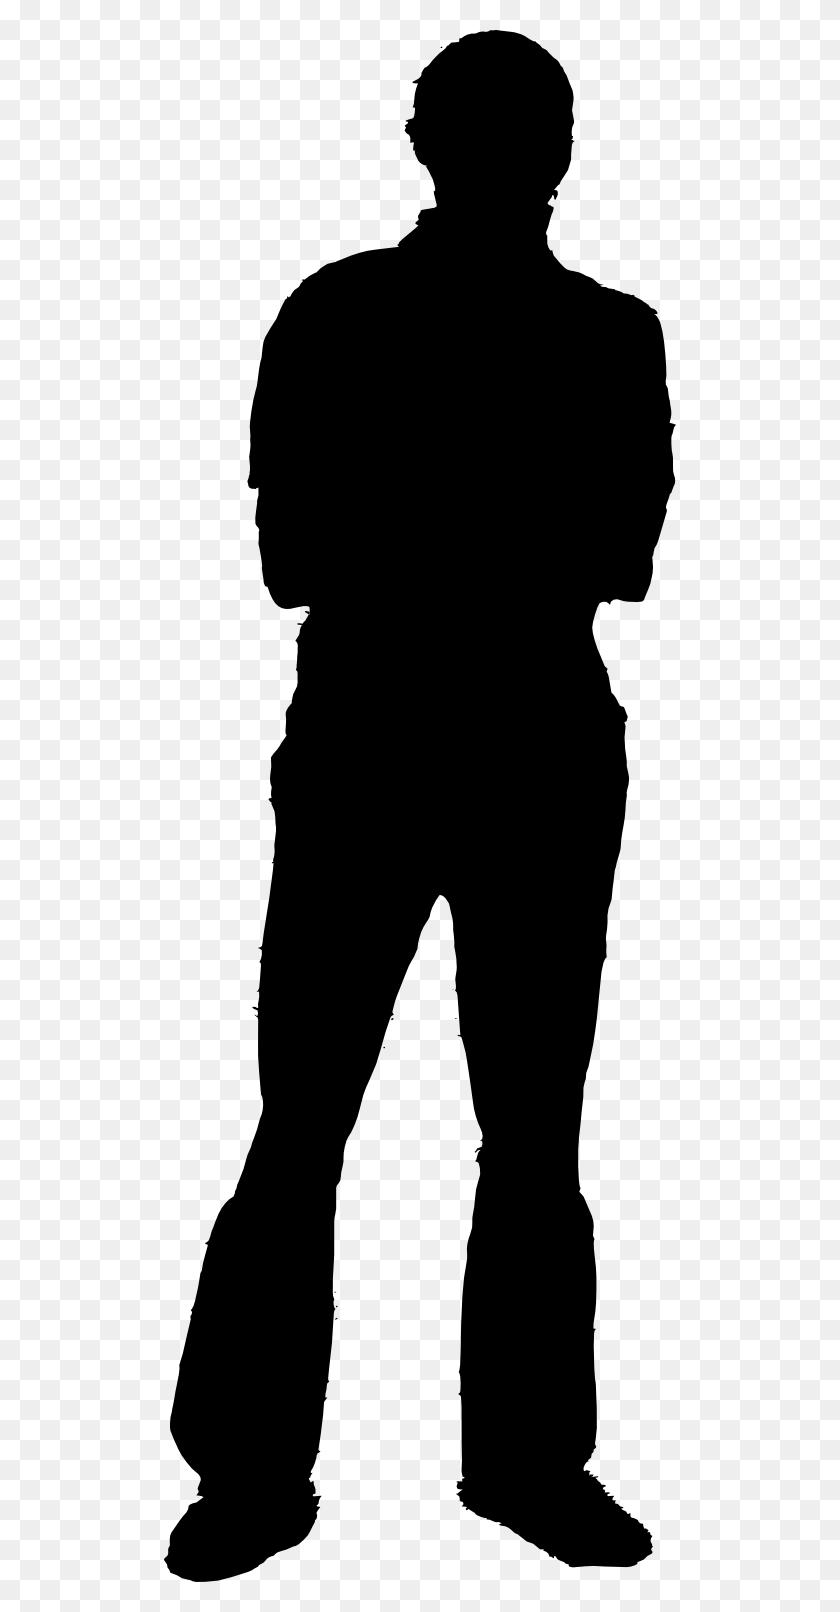 Unknown Clipart Person Silhouette - Person Clipart Black And White